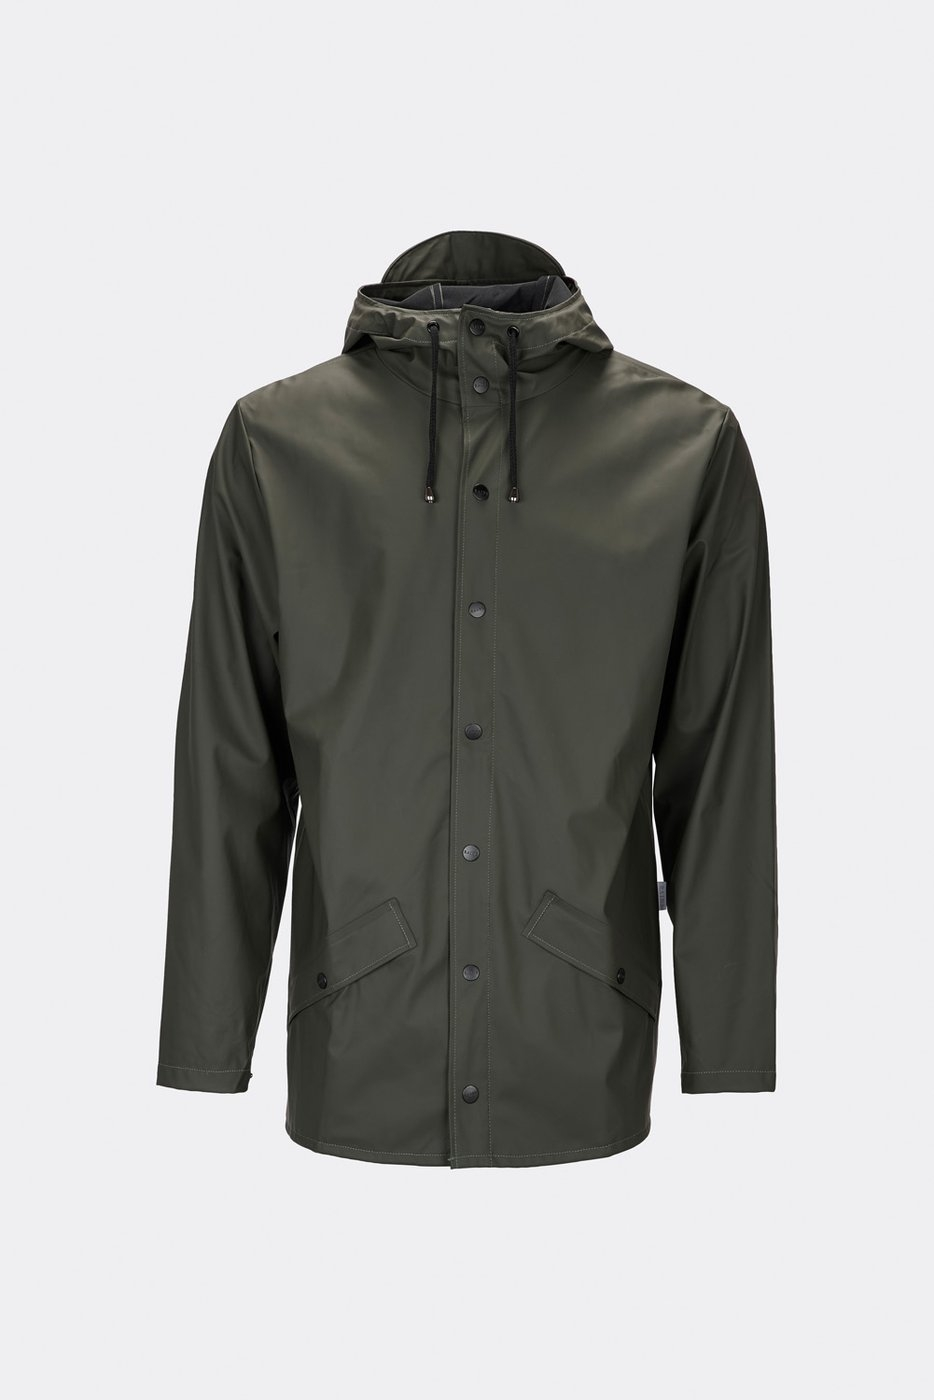 Rains Jacket green unisex M/L